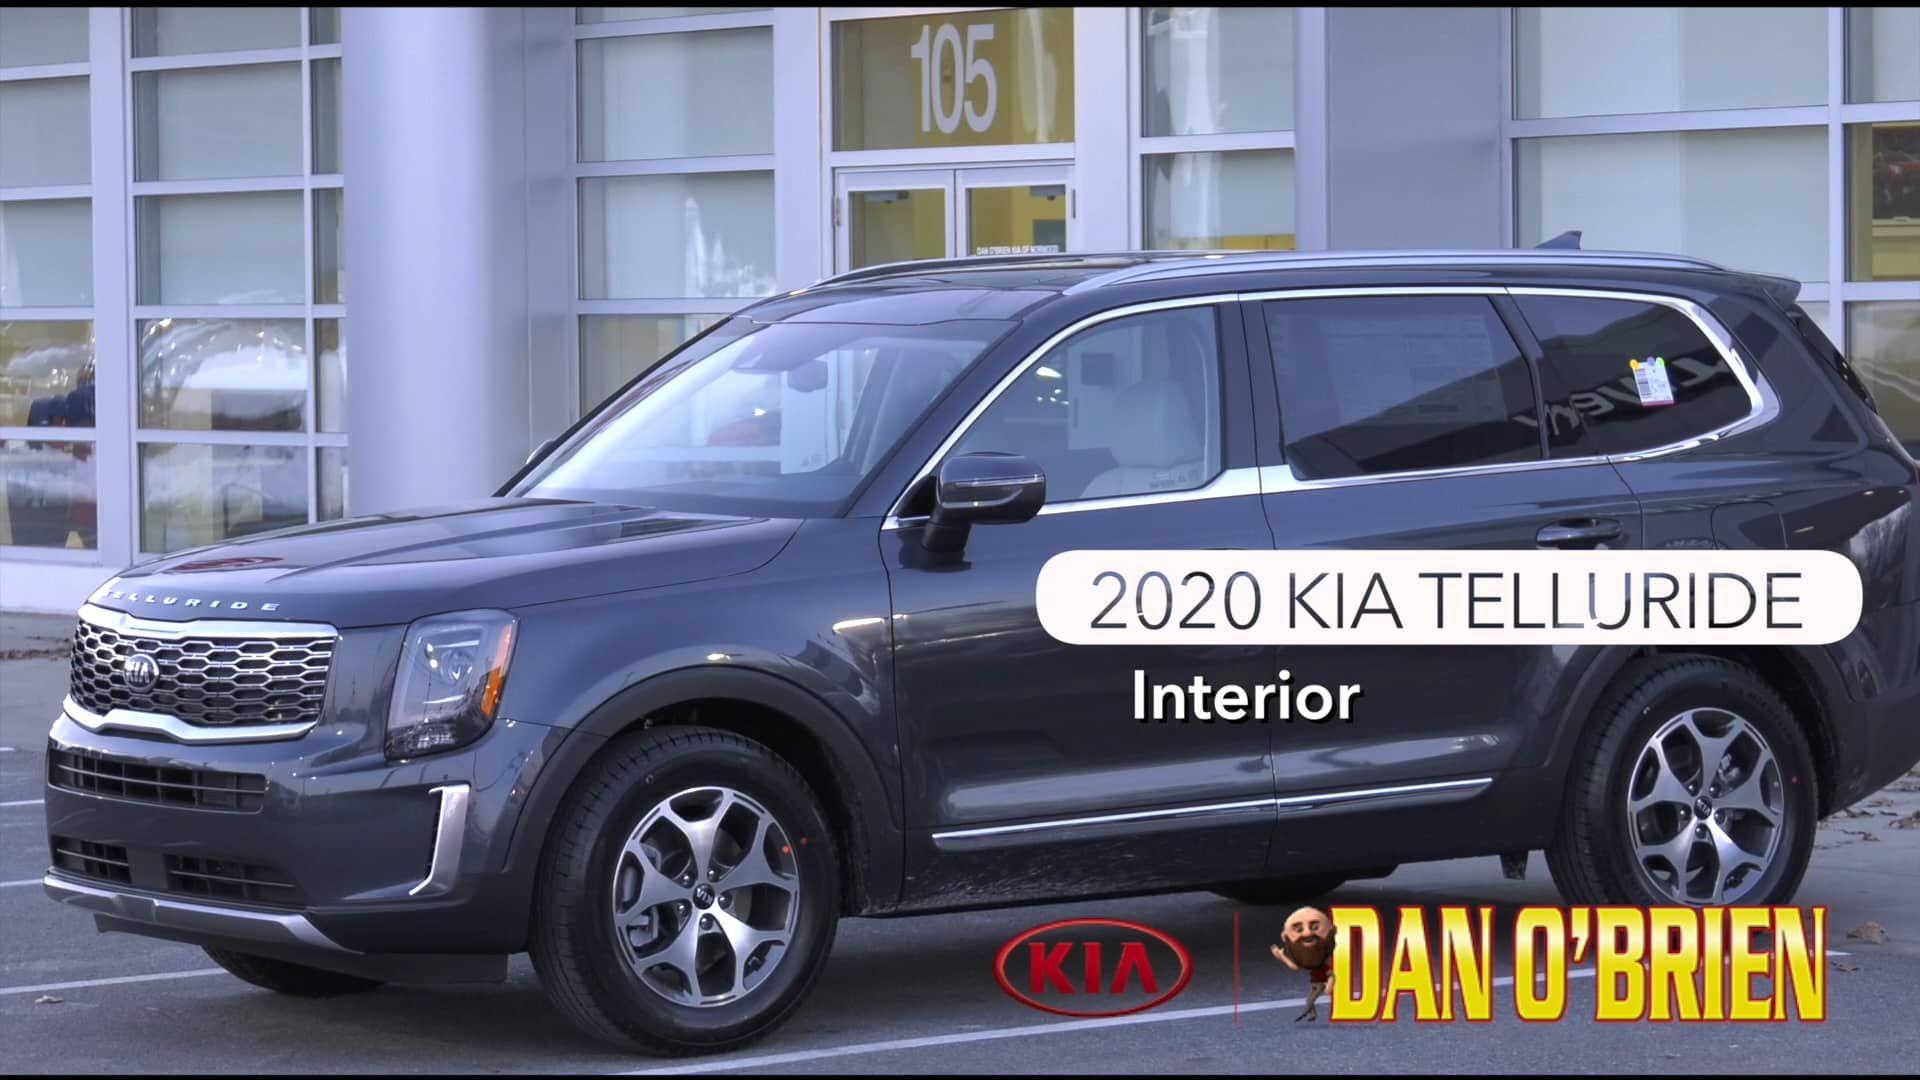 2020 Kia Telluride Comfortable And Spacious Concord Nh Dan O Brien Kia Kia Car Videos North Hampton